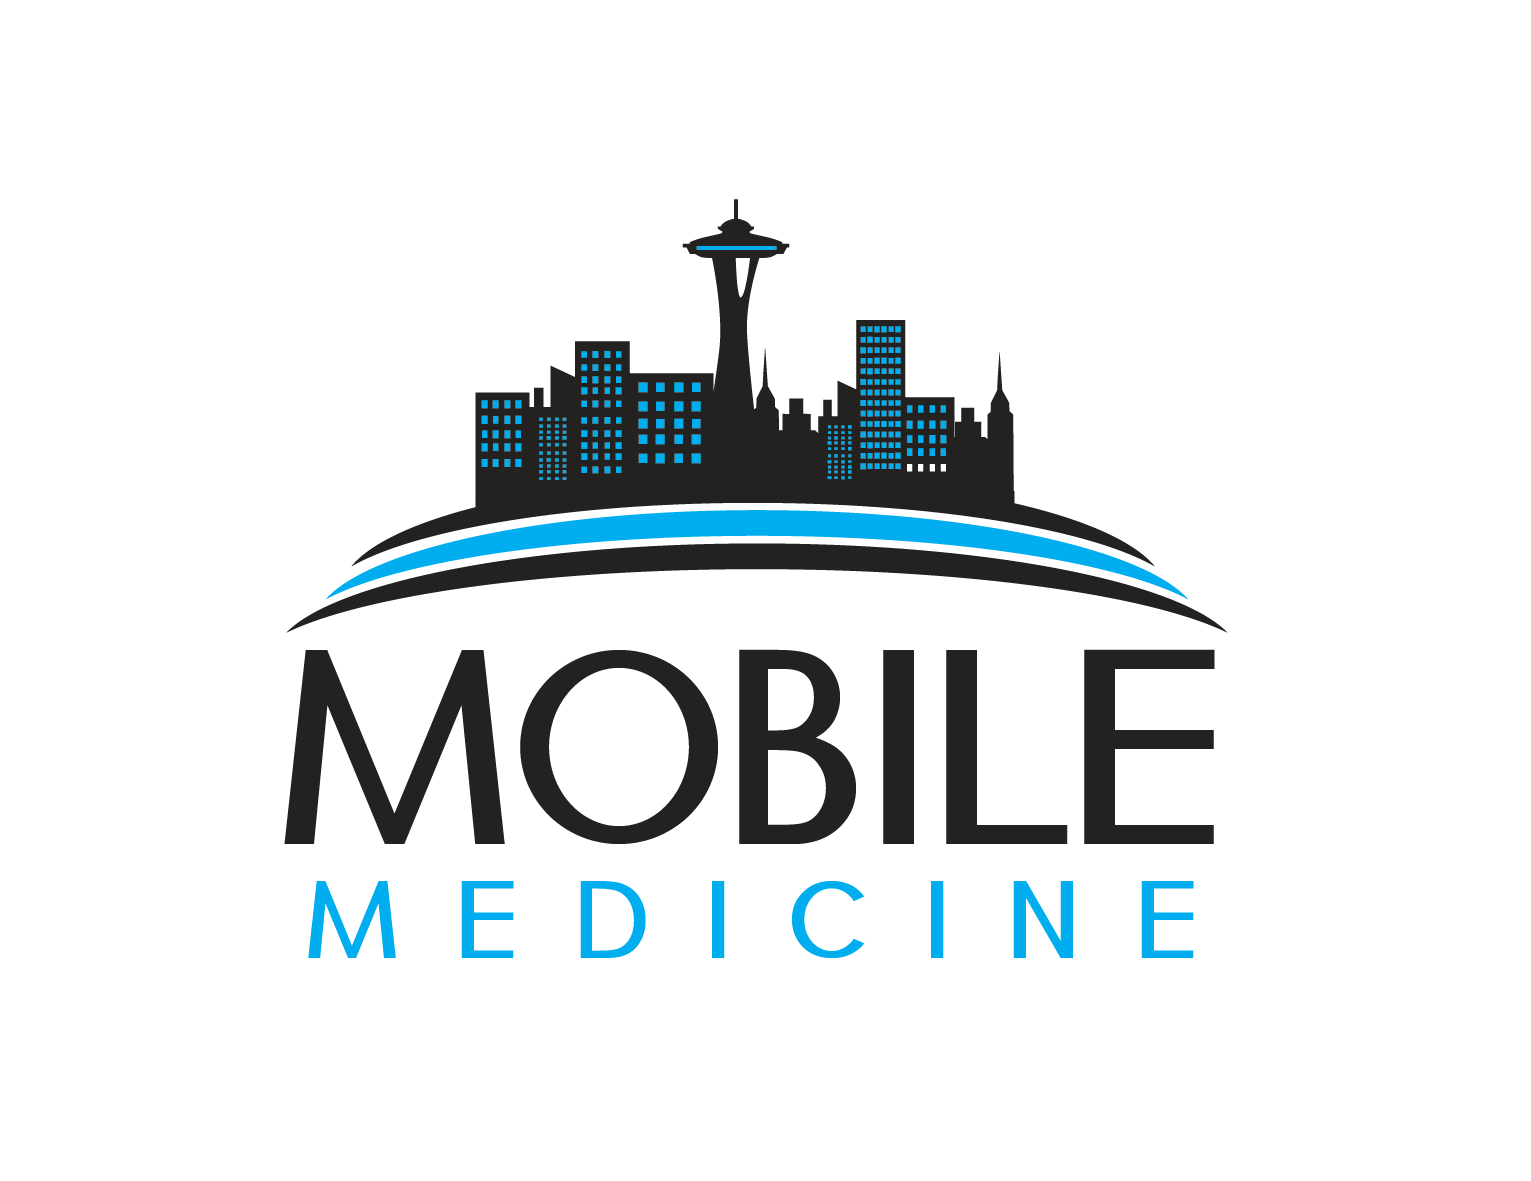 MobileMedicine.png